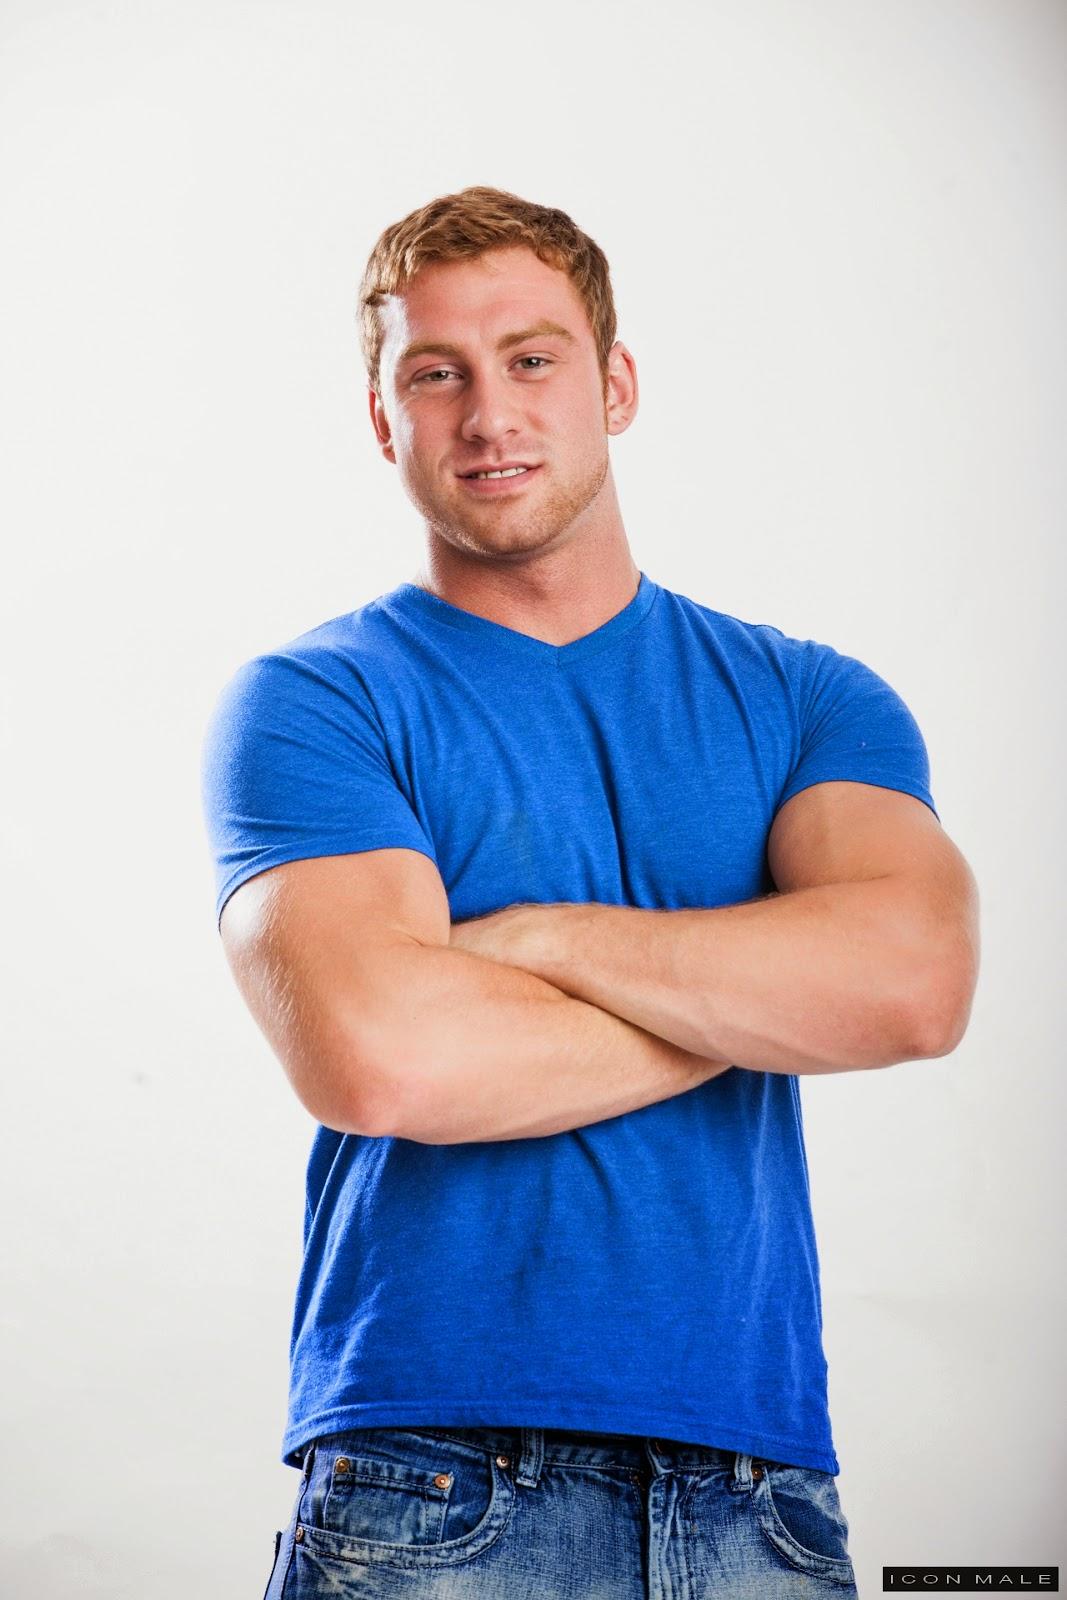 Sexy handsome american gay men with big 6